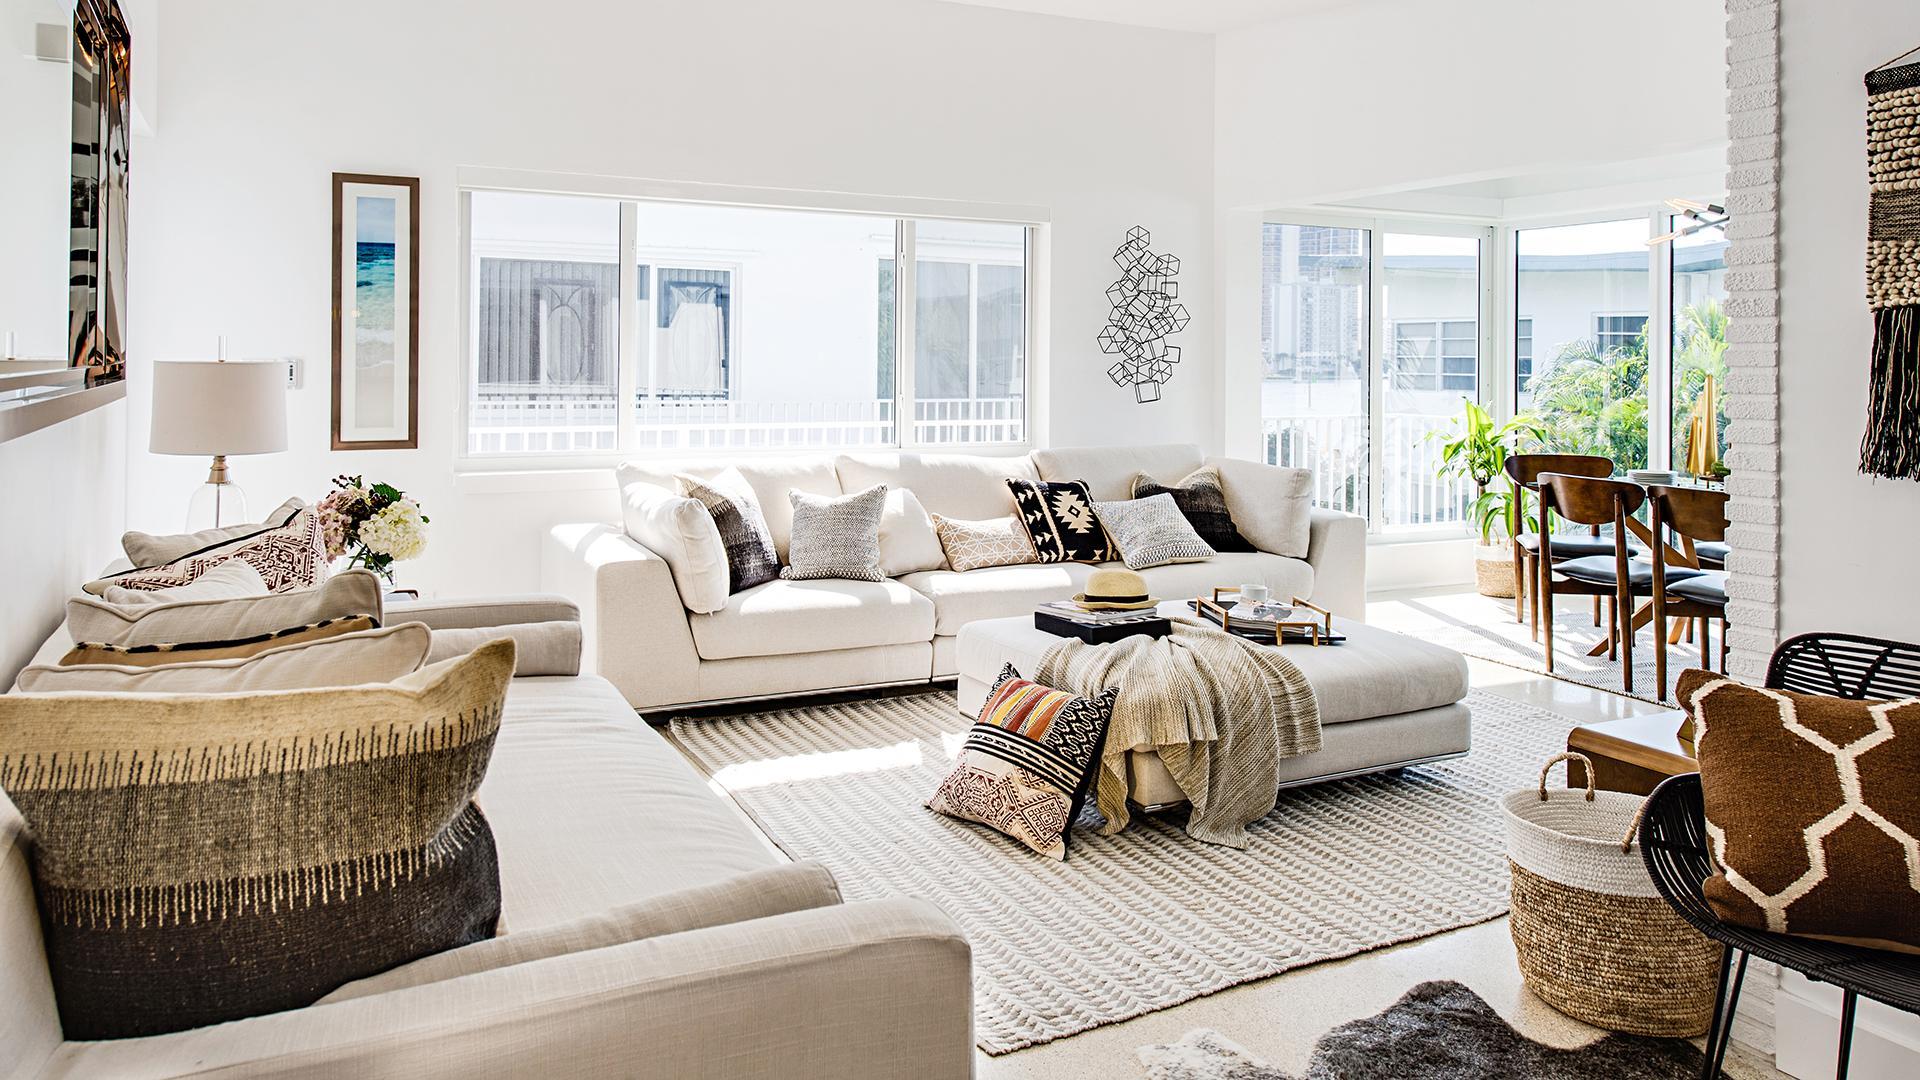 Home Tour: See Inside 3 Celeb Interior Designers' Favorite ... on